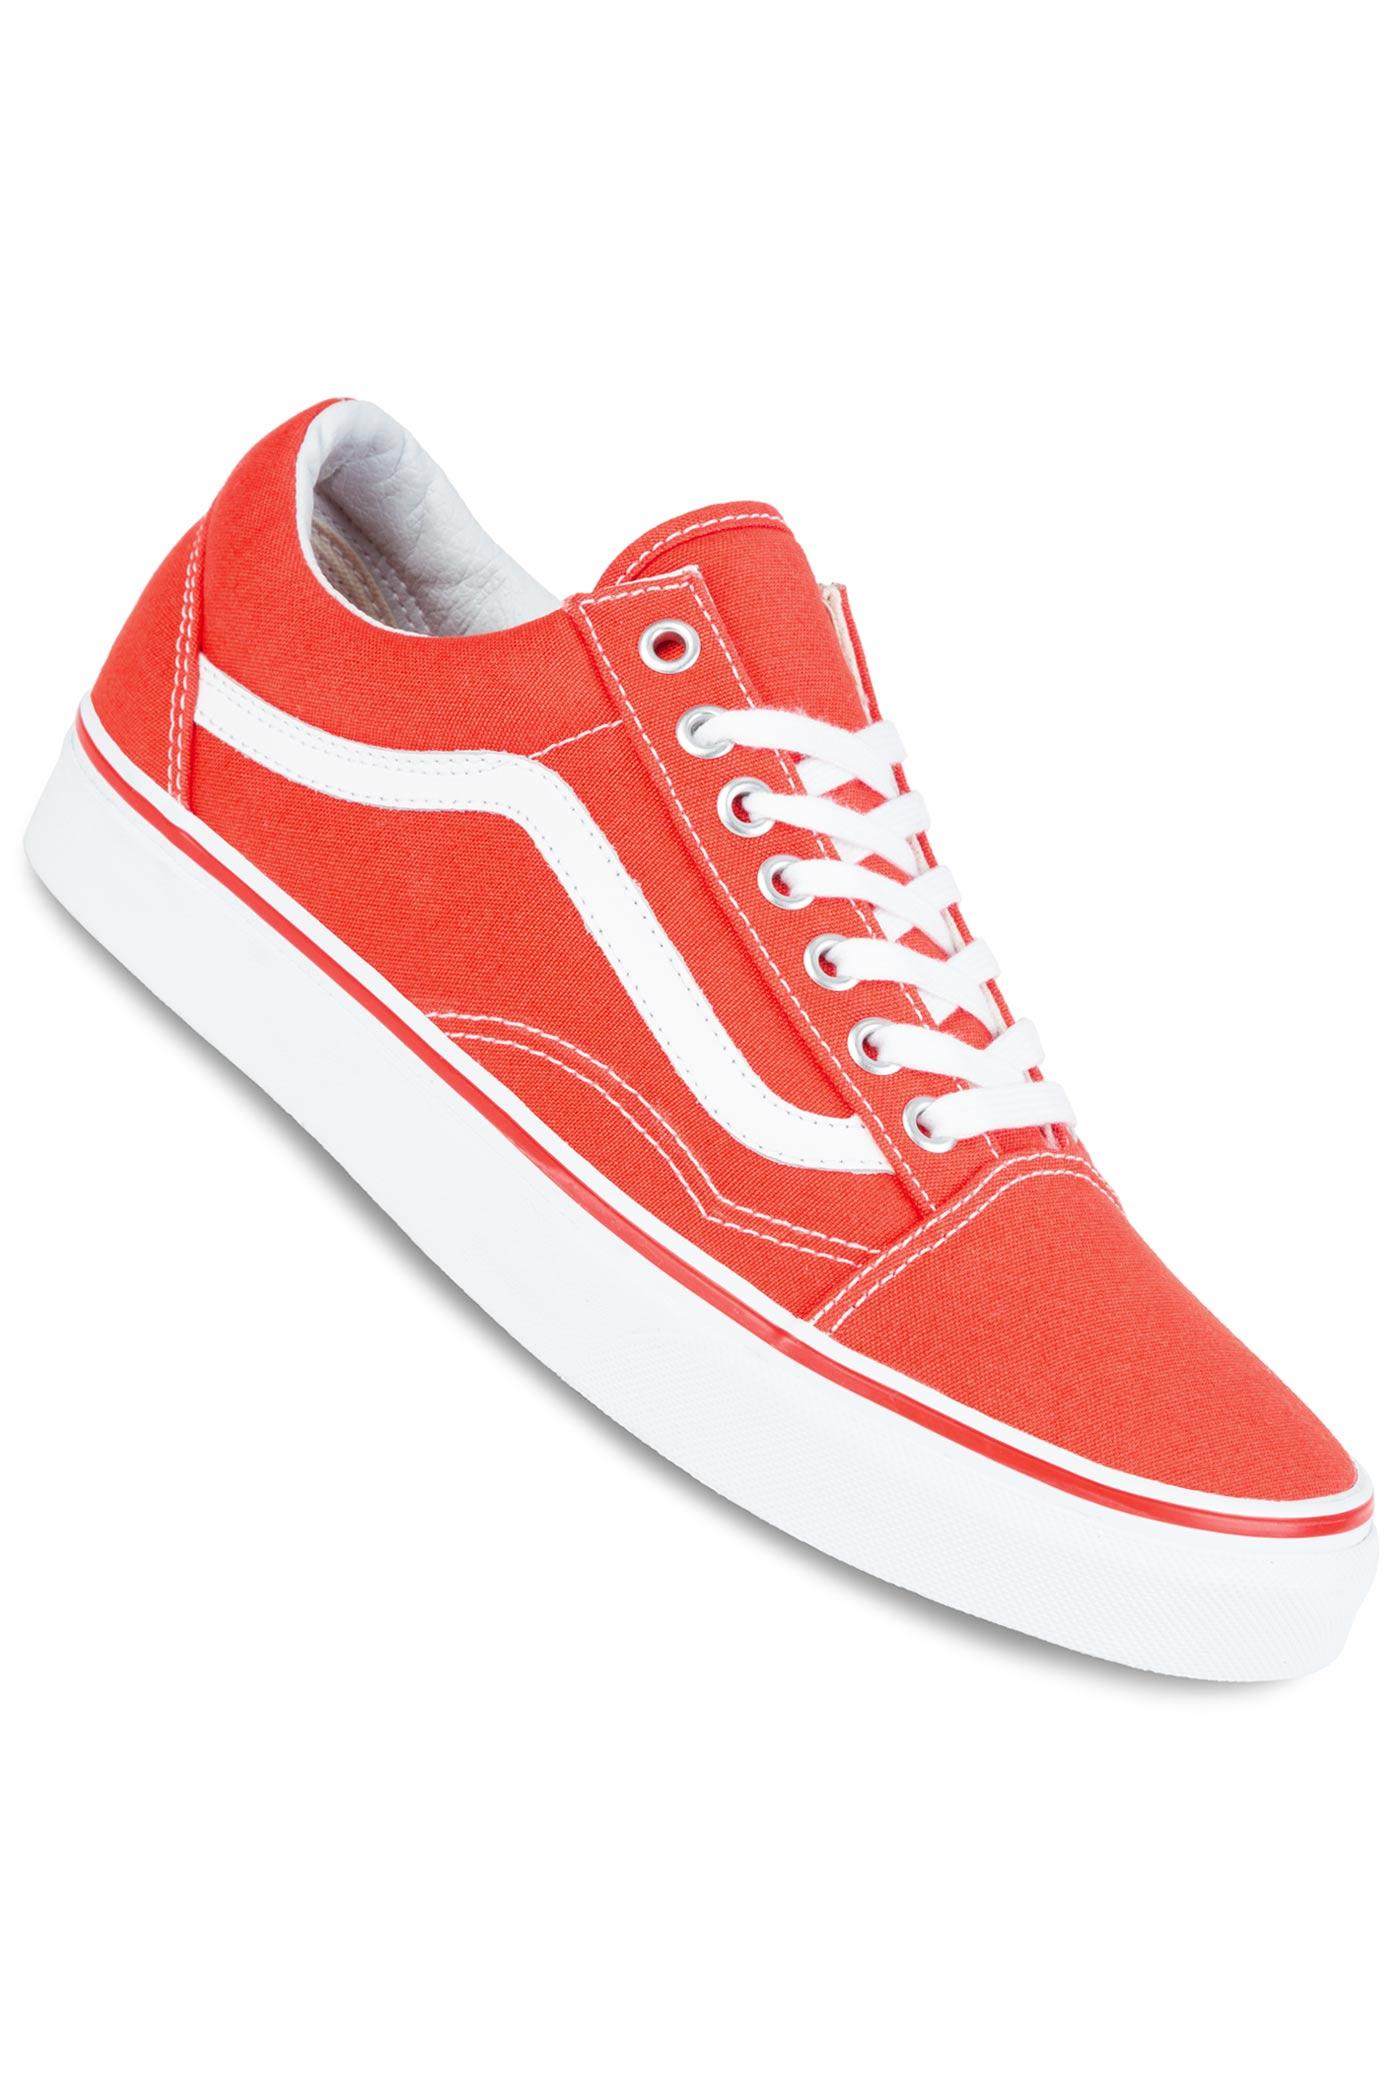 dab2d3ea7a63 Vans Old Skool Shoe (cherry tomato true white) buy at skatedeluxe